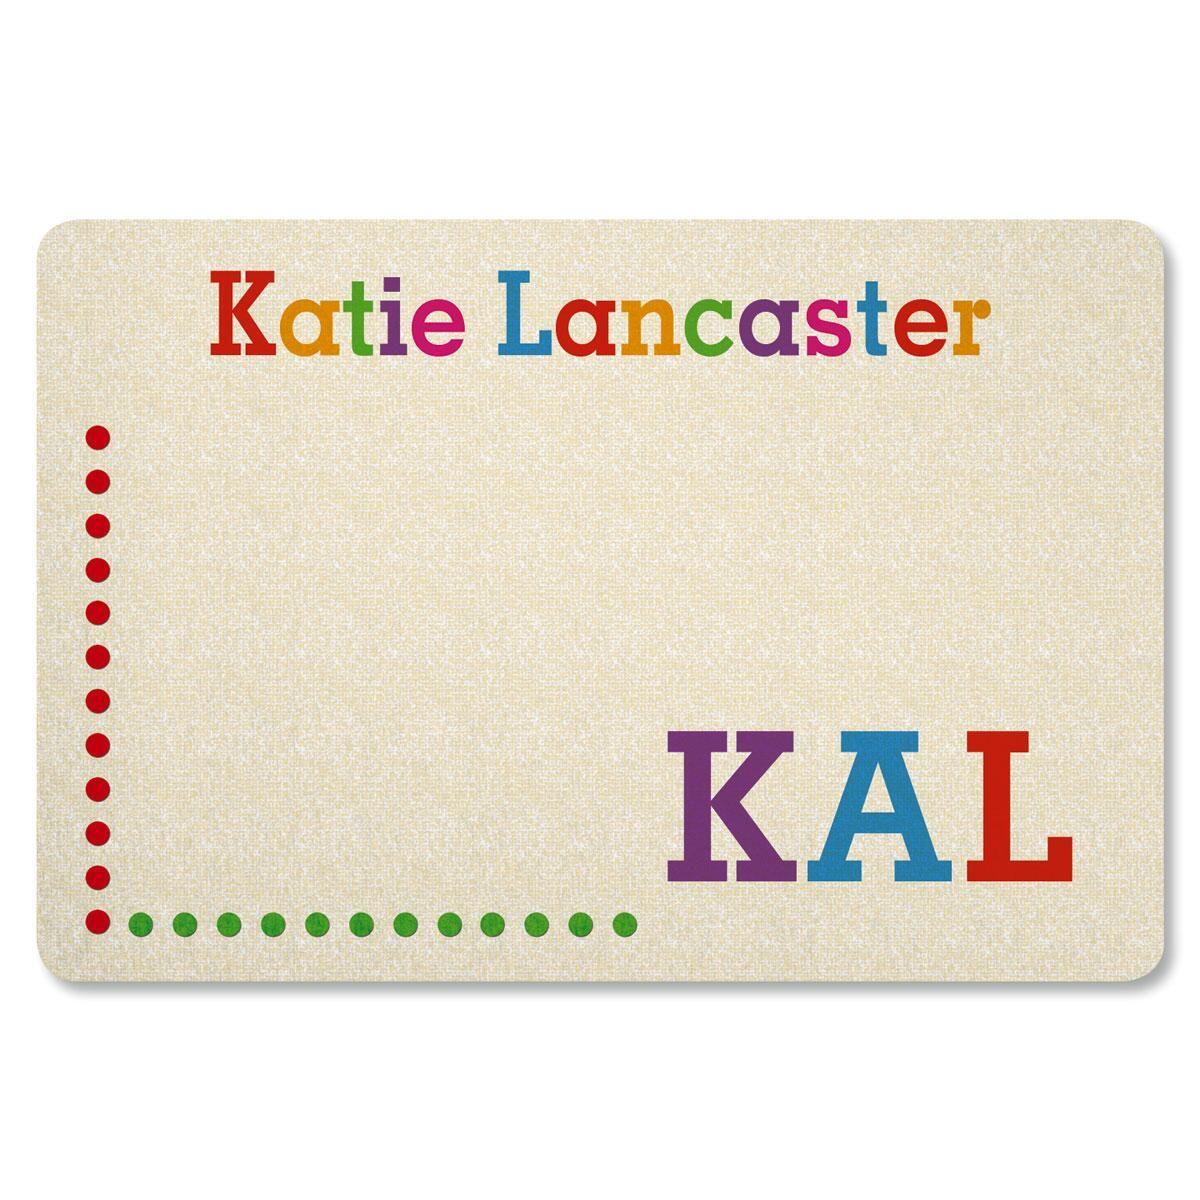 Whimsical Name Custom Doormat